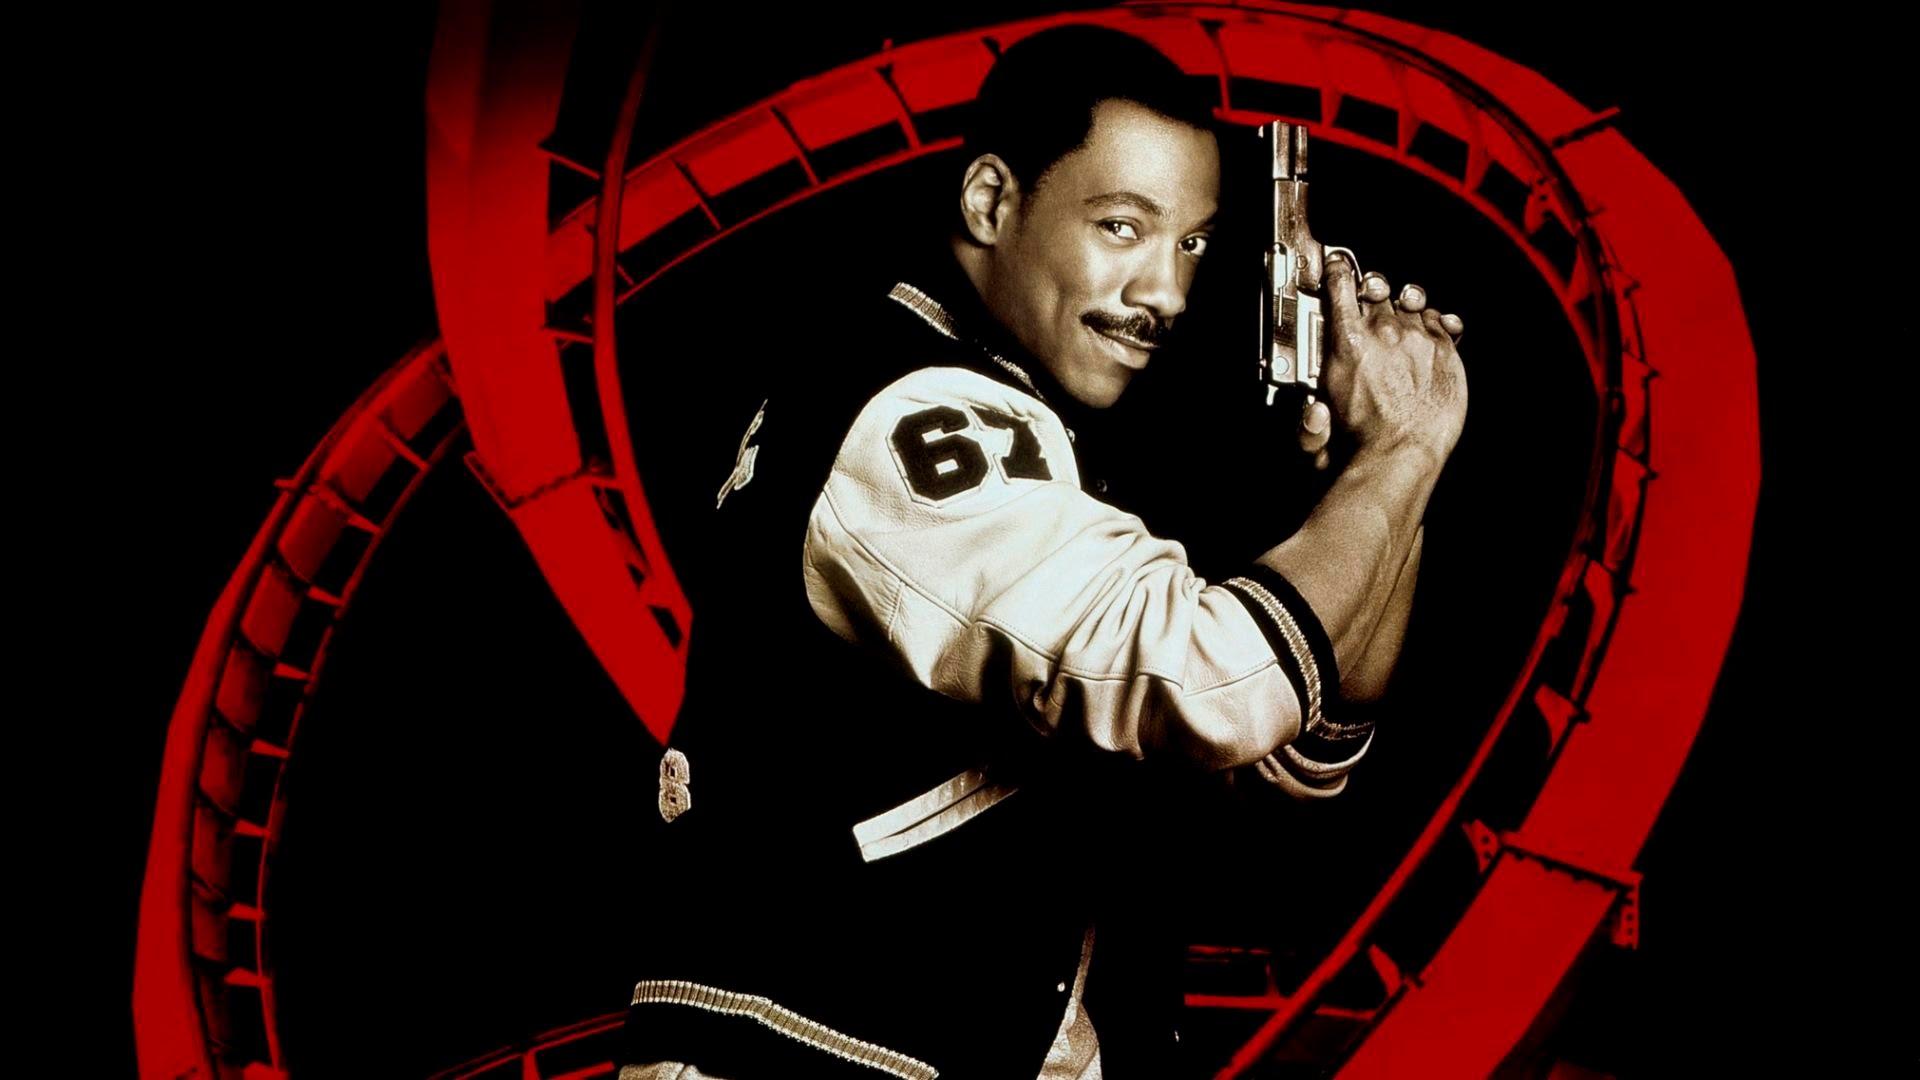 Beverly Hills Cop III - Un piedipiatti a Beverly Hills, Stasera su Rete 4 1